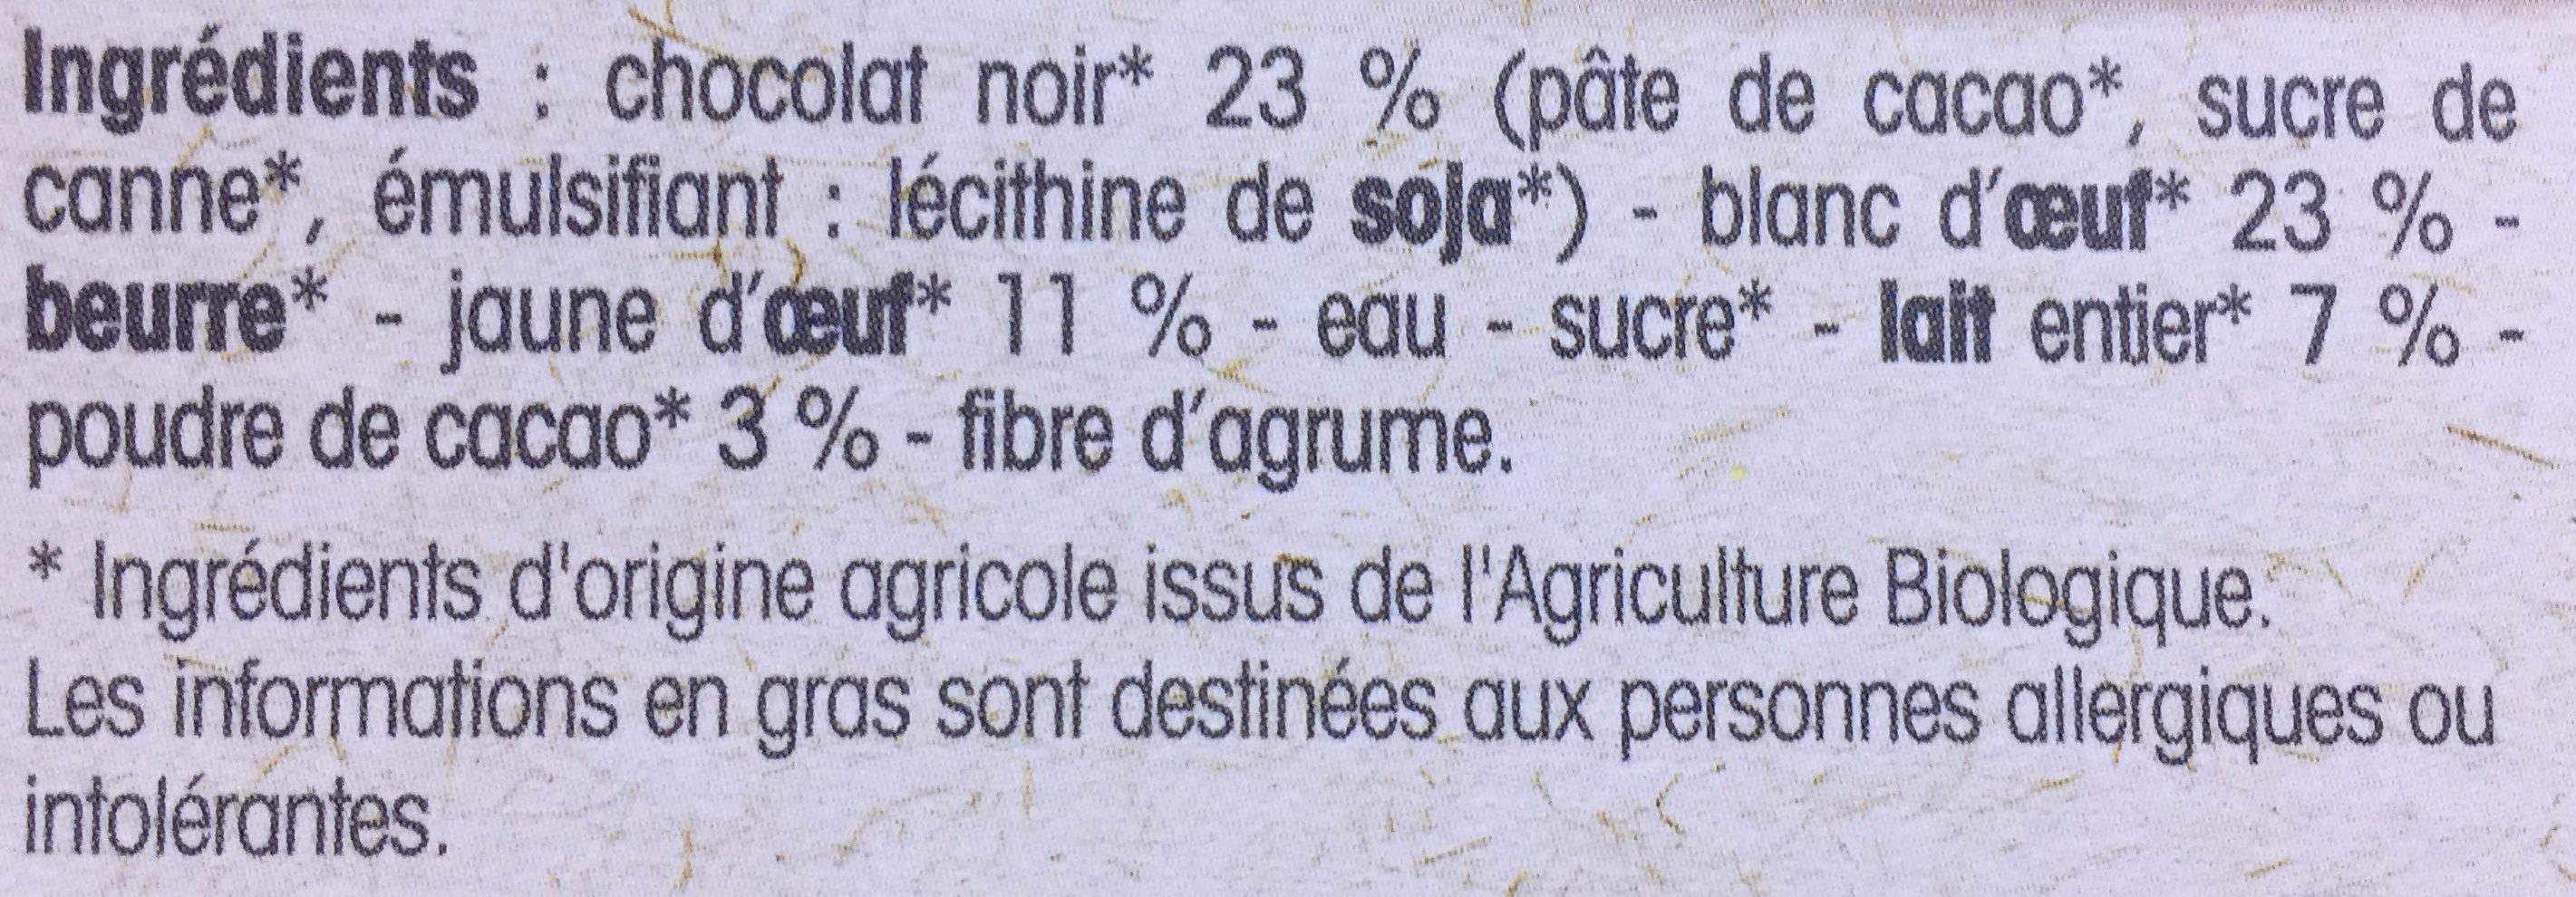 Mousse Chocolat noir - Ingredients